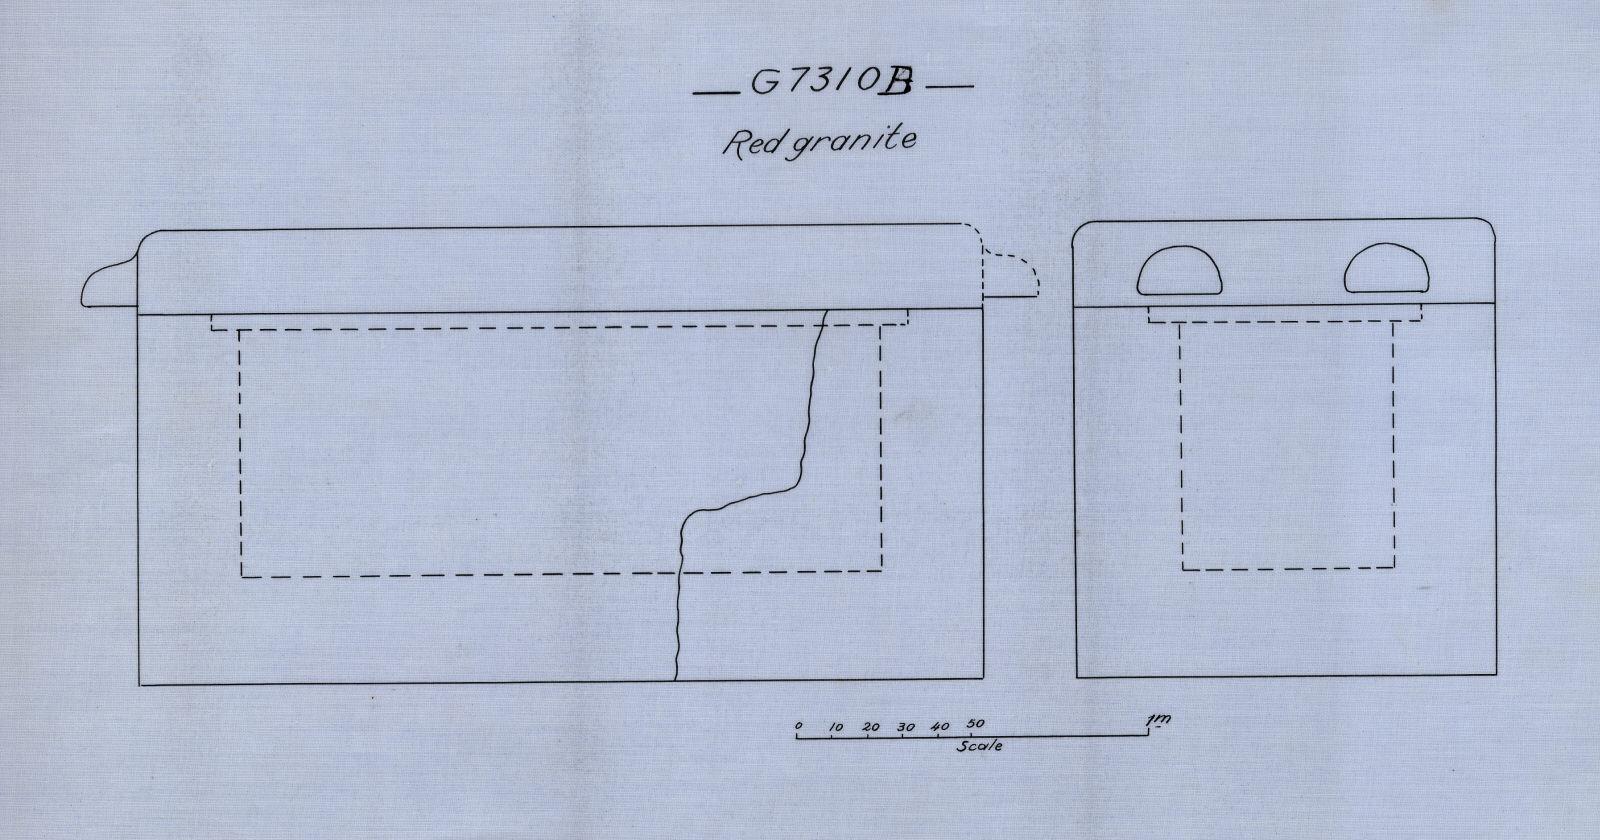 Drawings: G 7310, Shaft B: sarcophagus, red granite